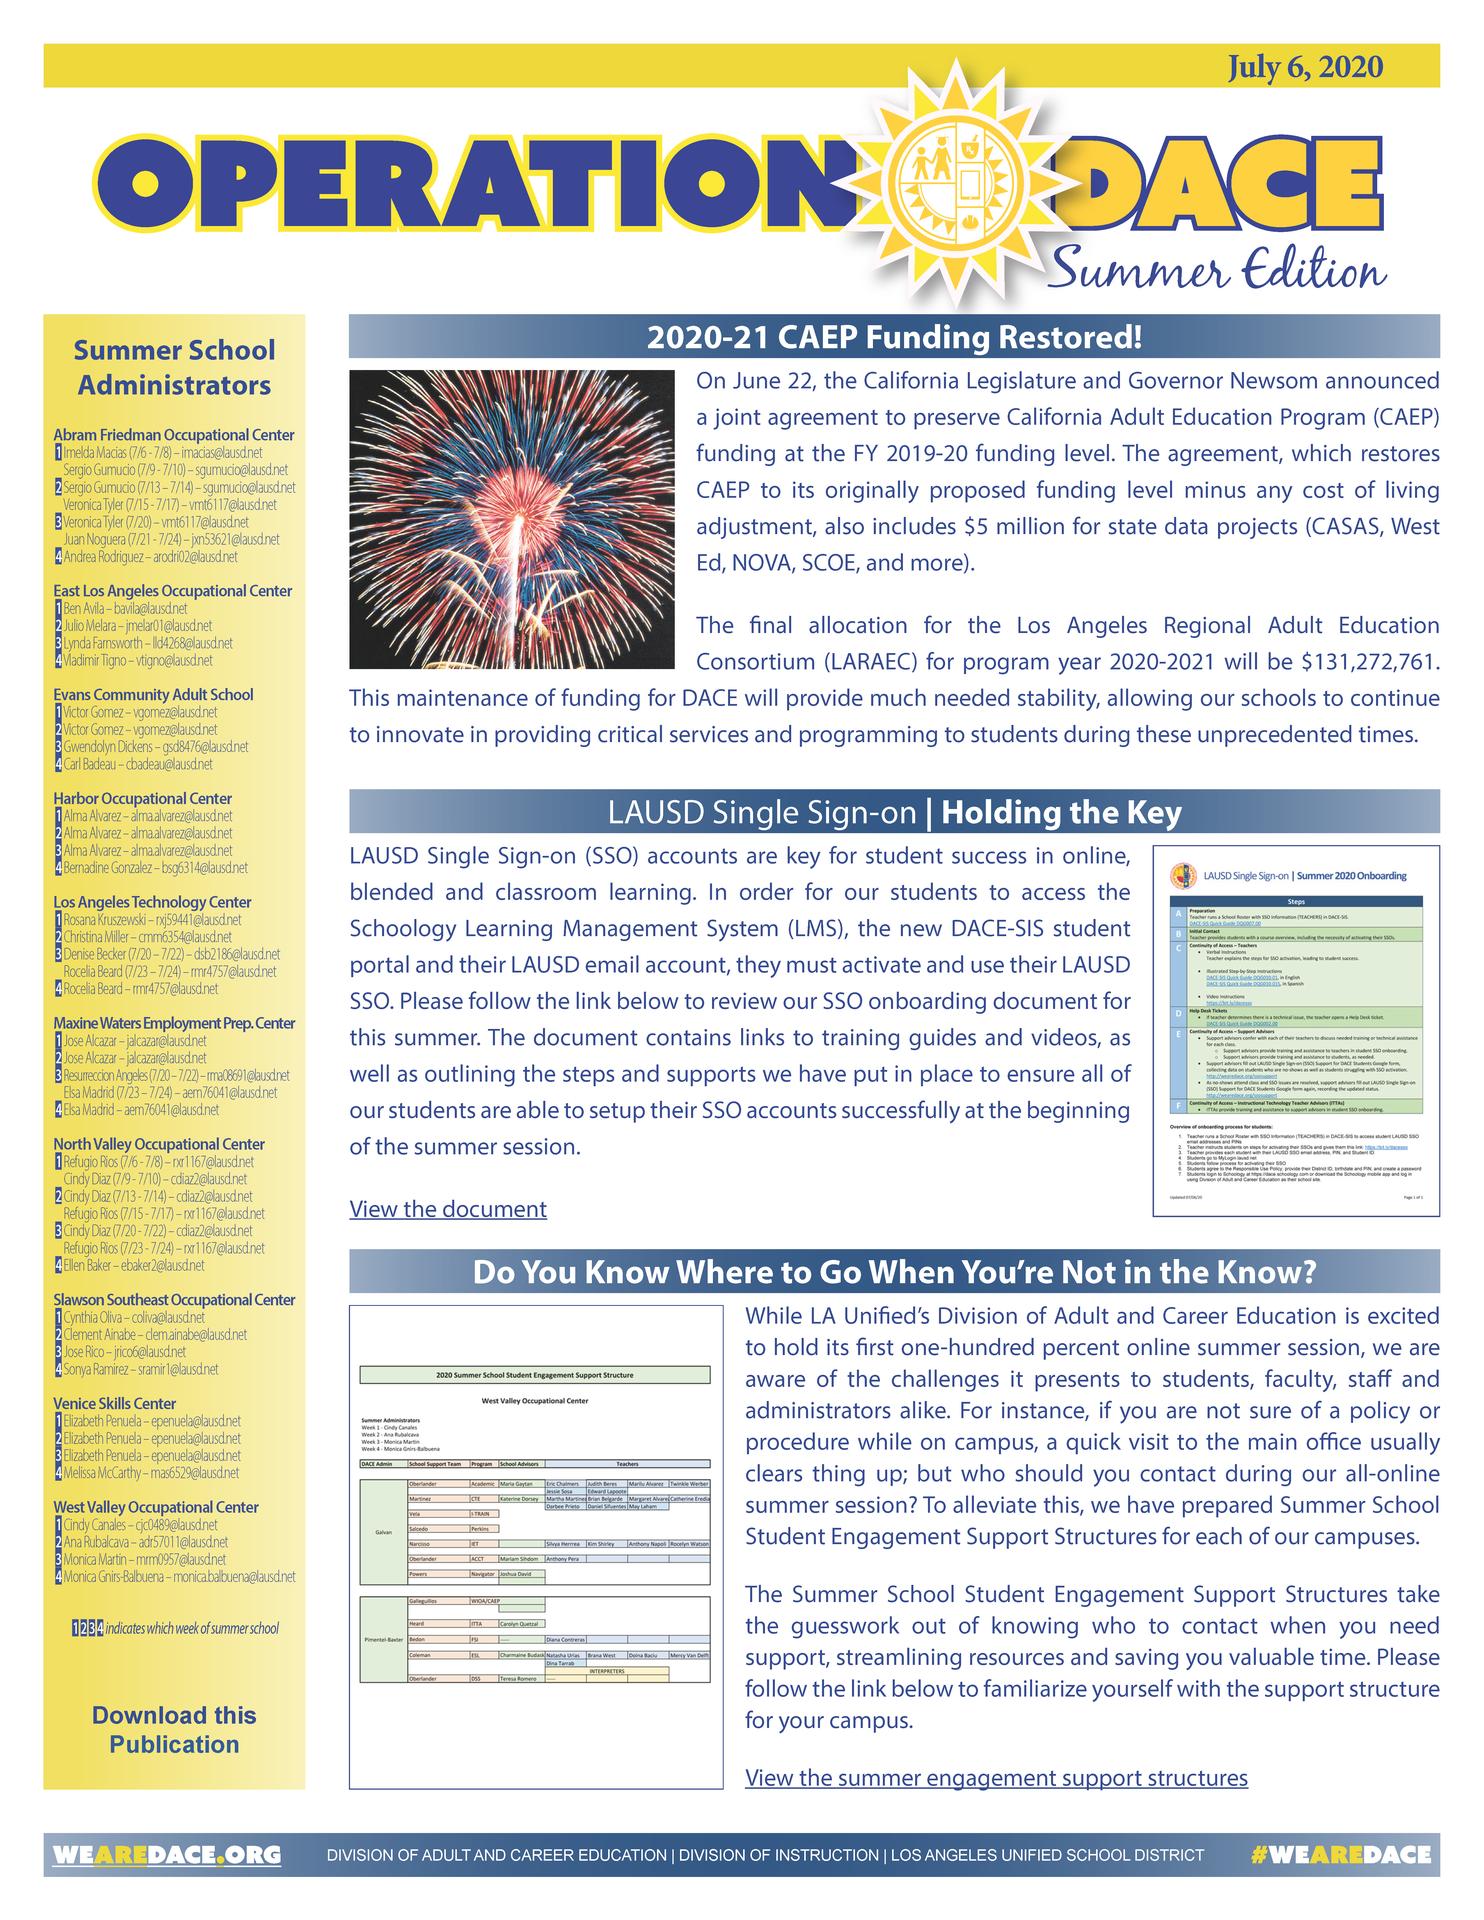 DACE Summer Newsletter - July 06, 2020 Thumbnail